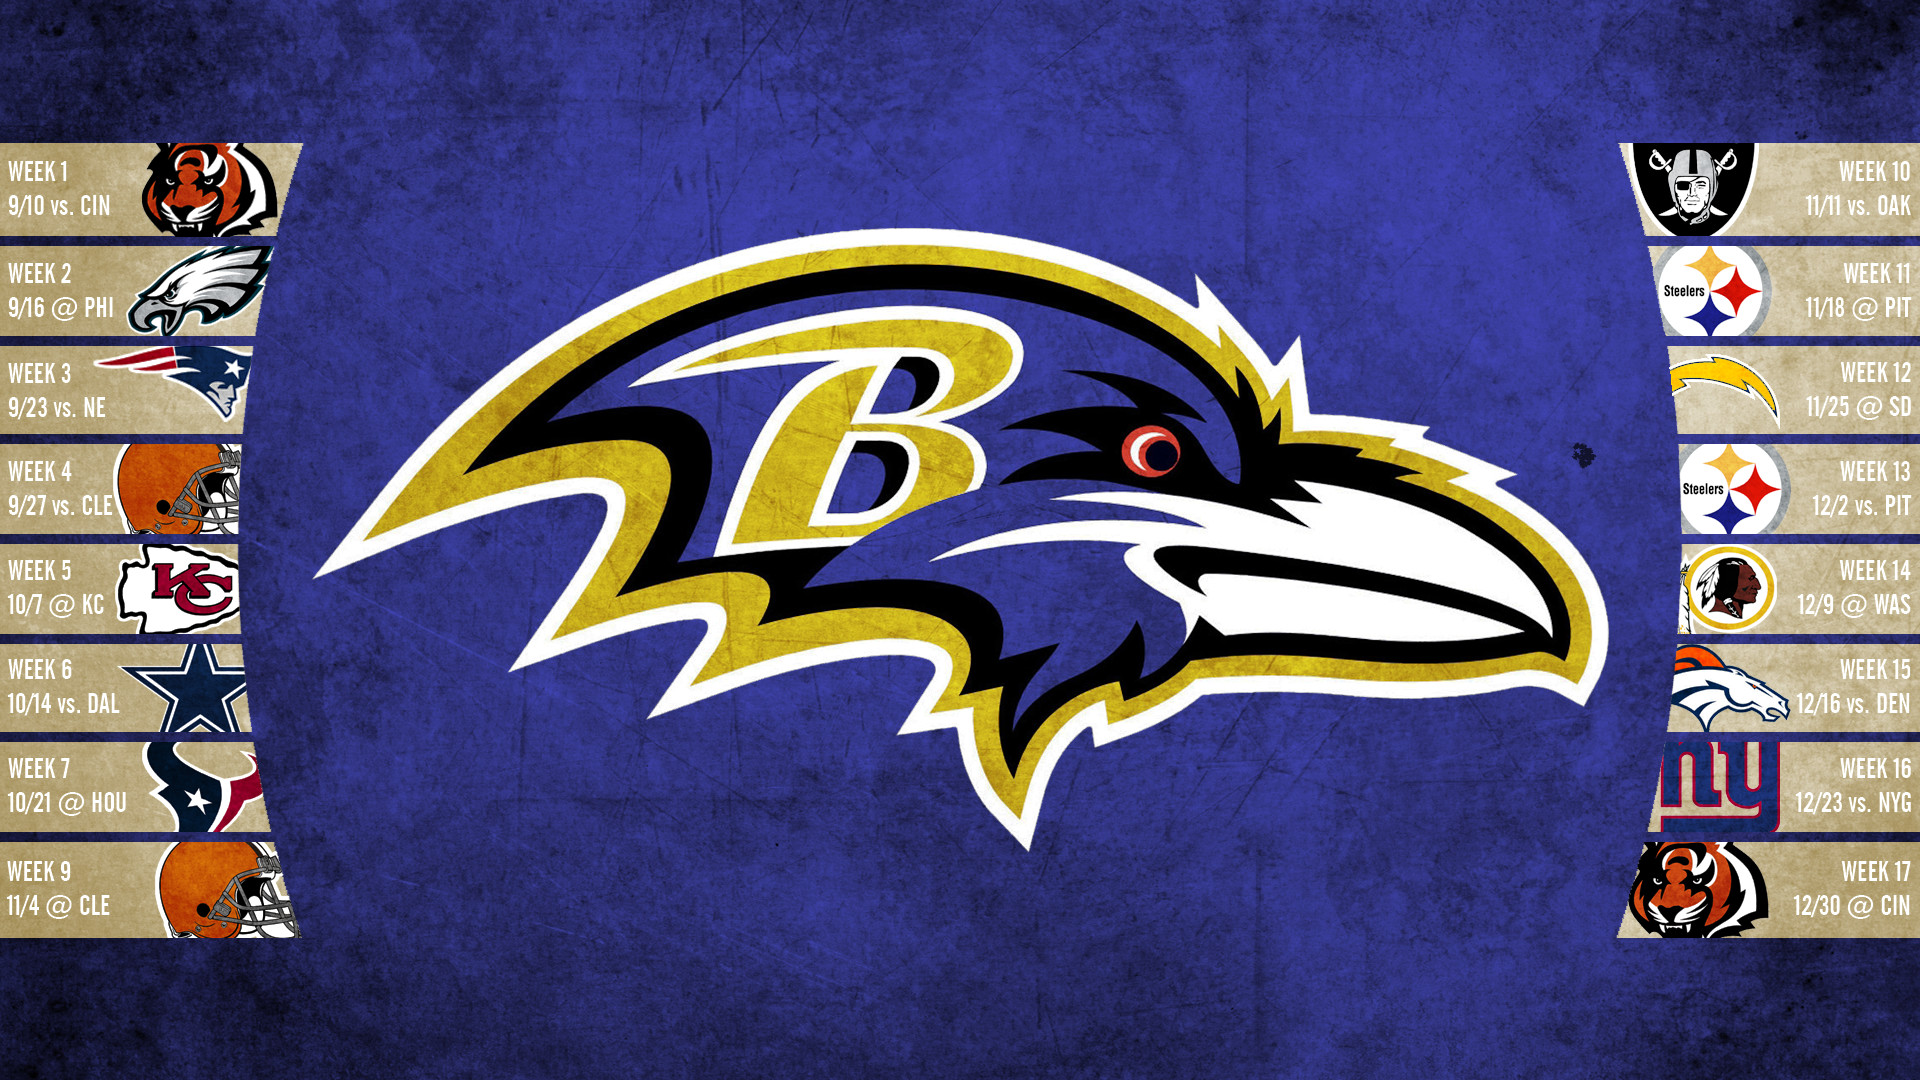 best Baltimore Ravens wallpaper wallpaper ever??   Baltimore Ravens .